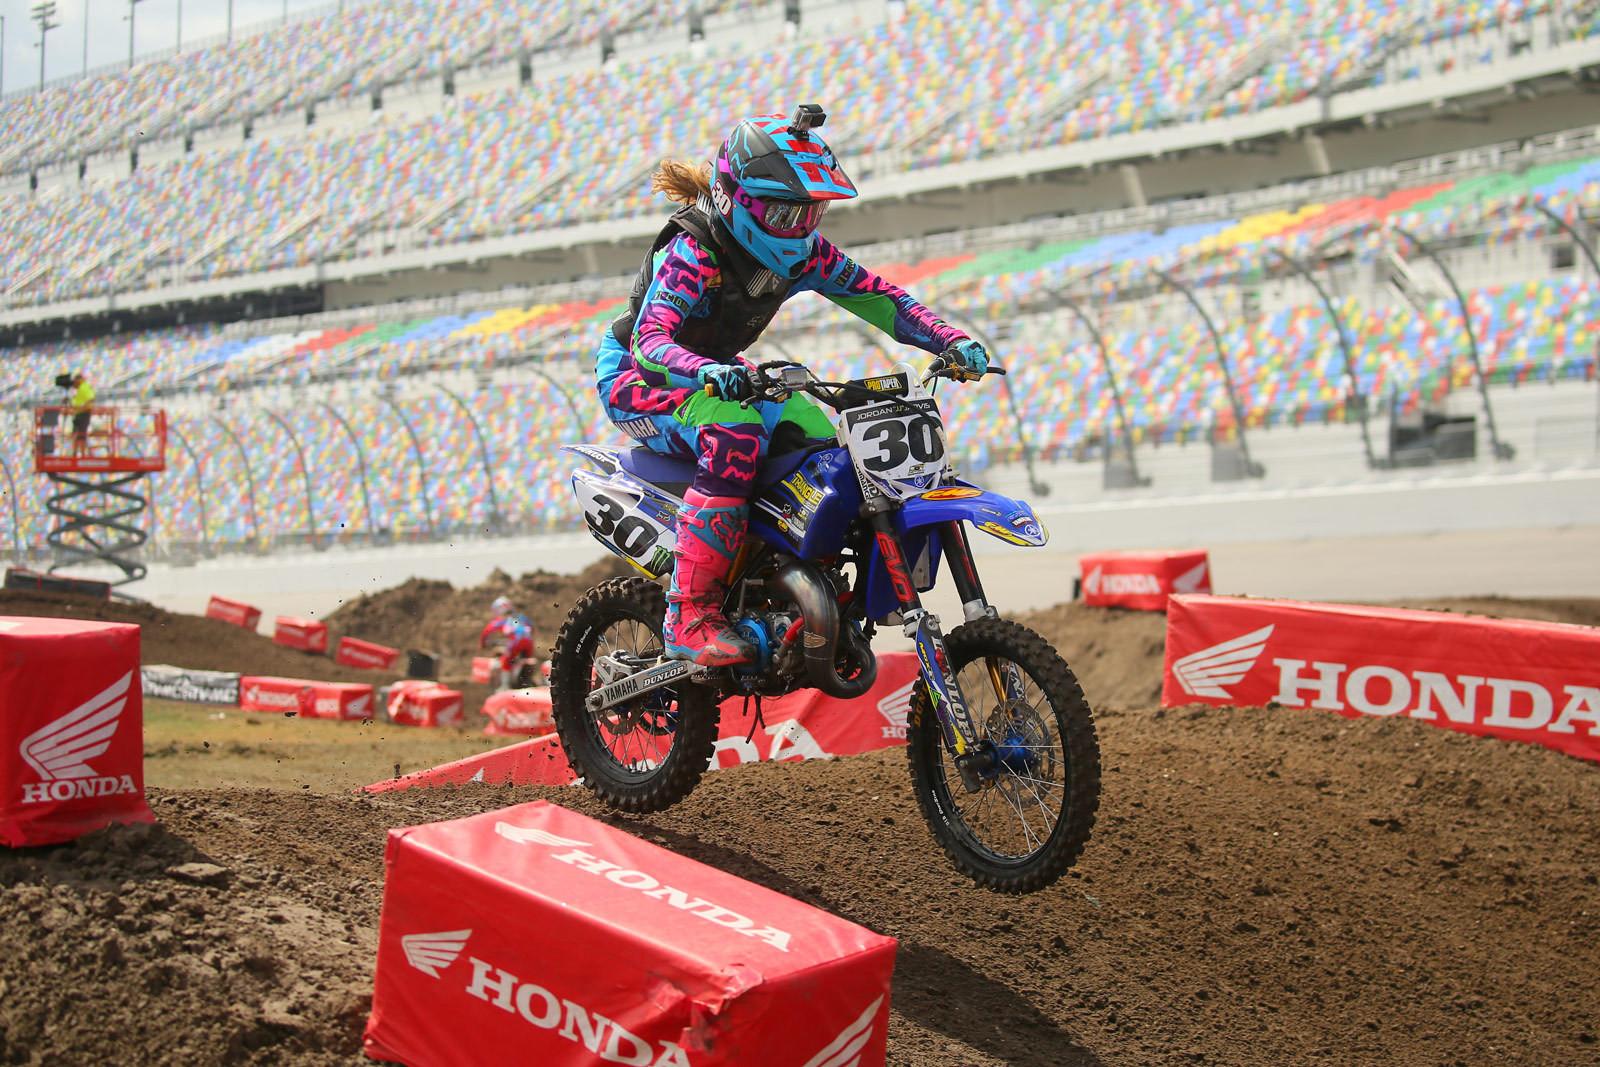 Jordan Jarvis - 2016 Ricky Carmichael Amateur Supercross - Motocross Pictures - Vital MX